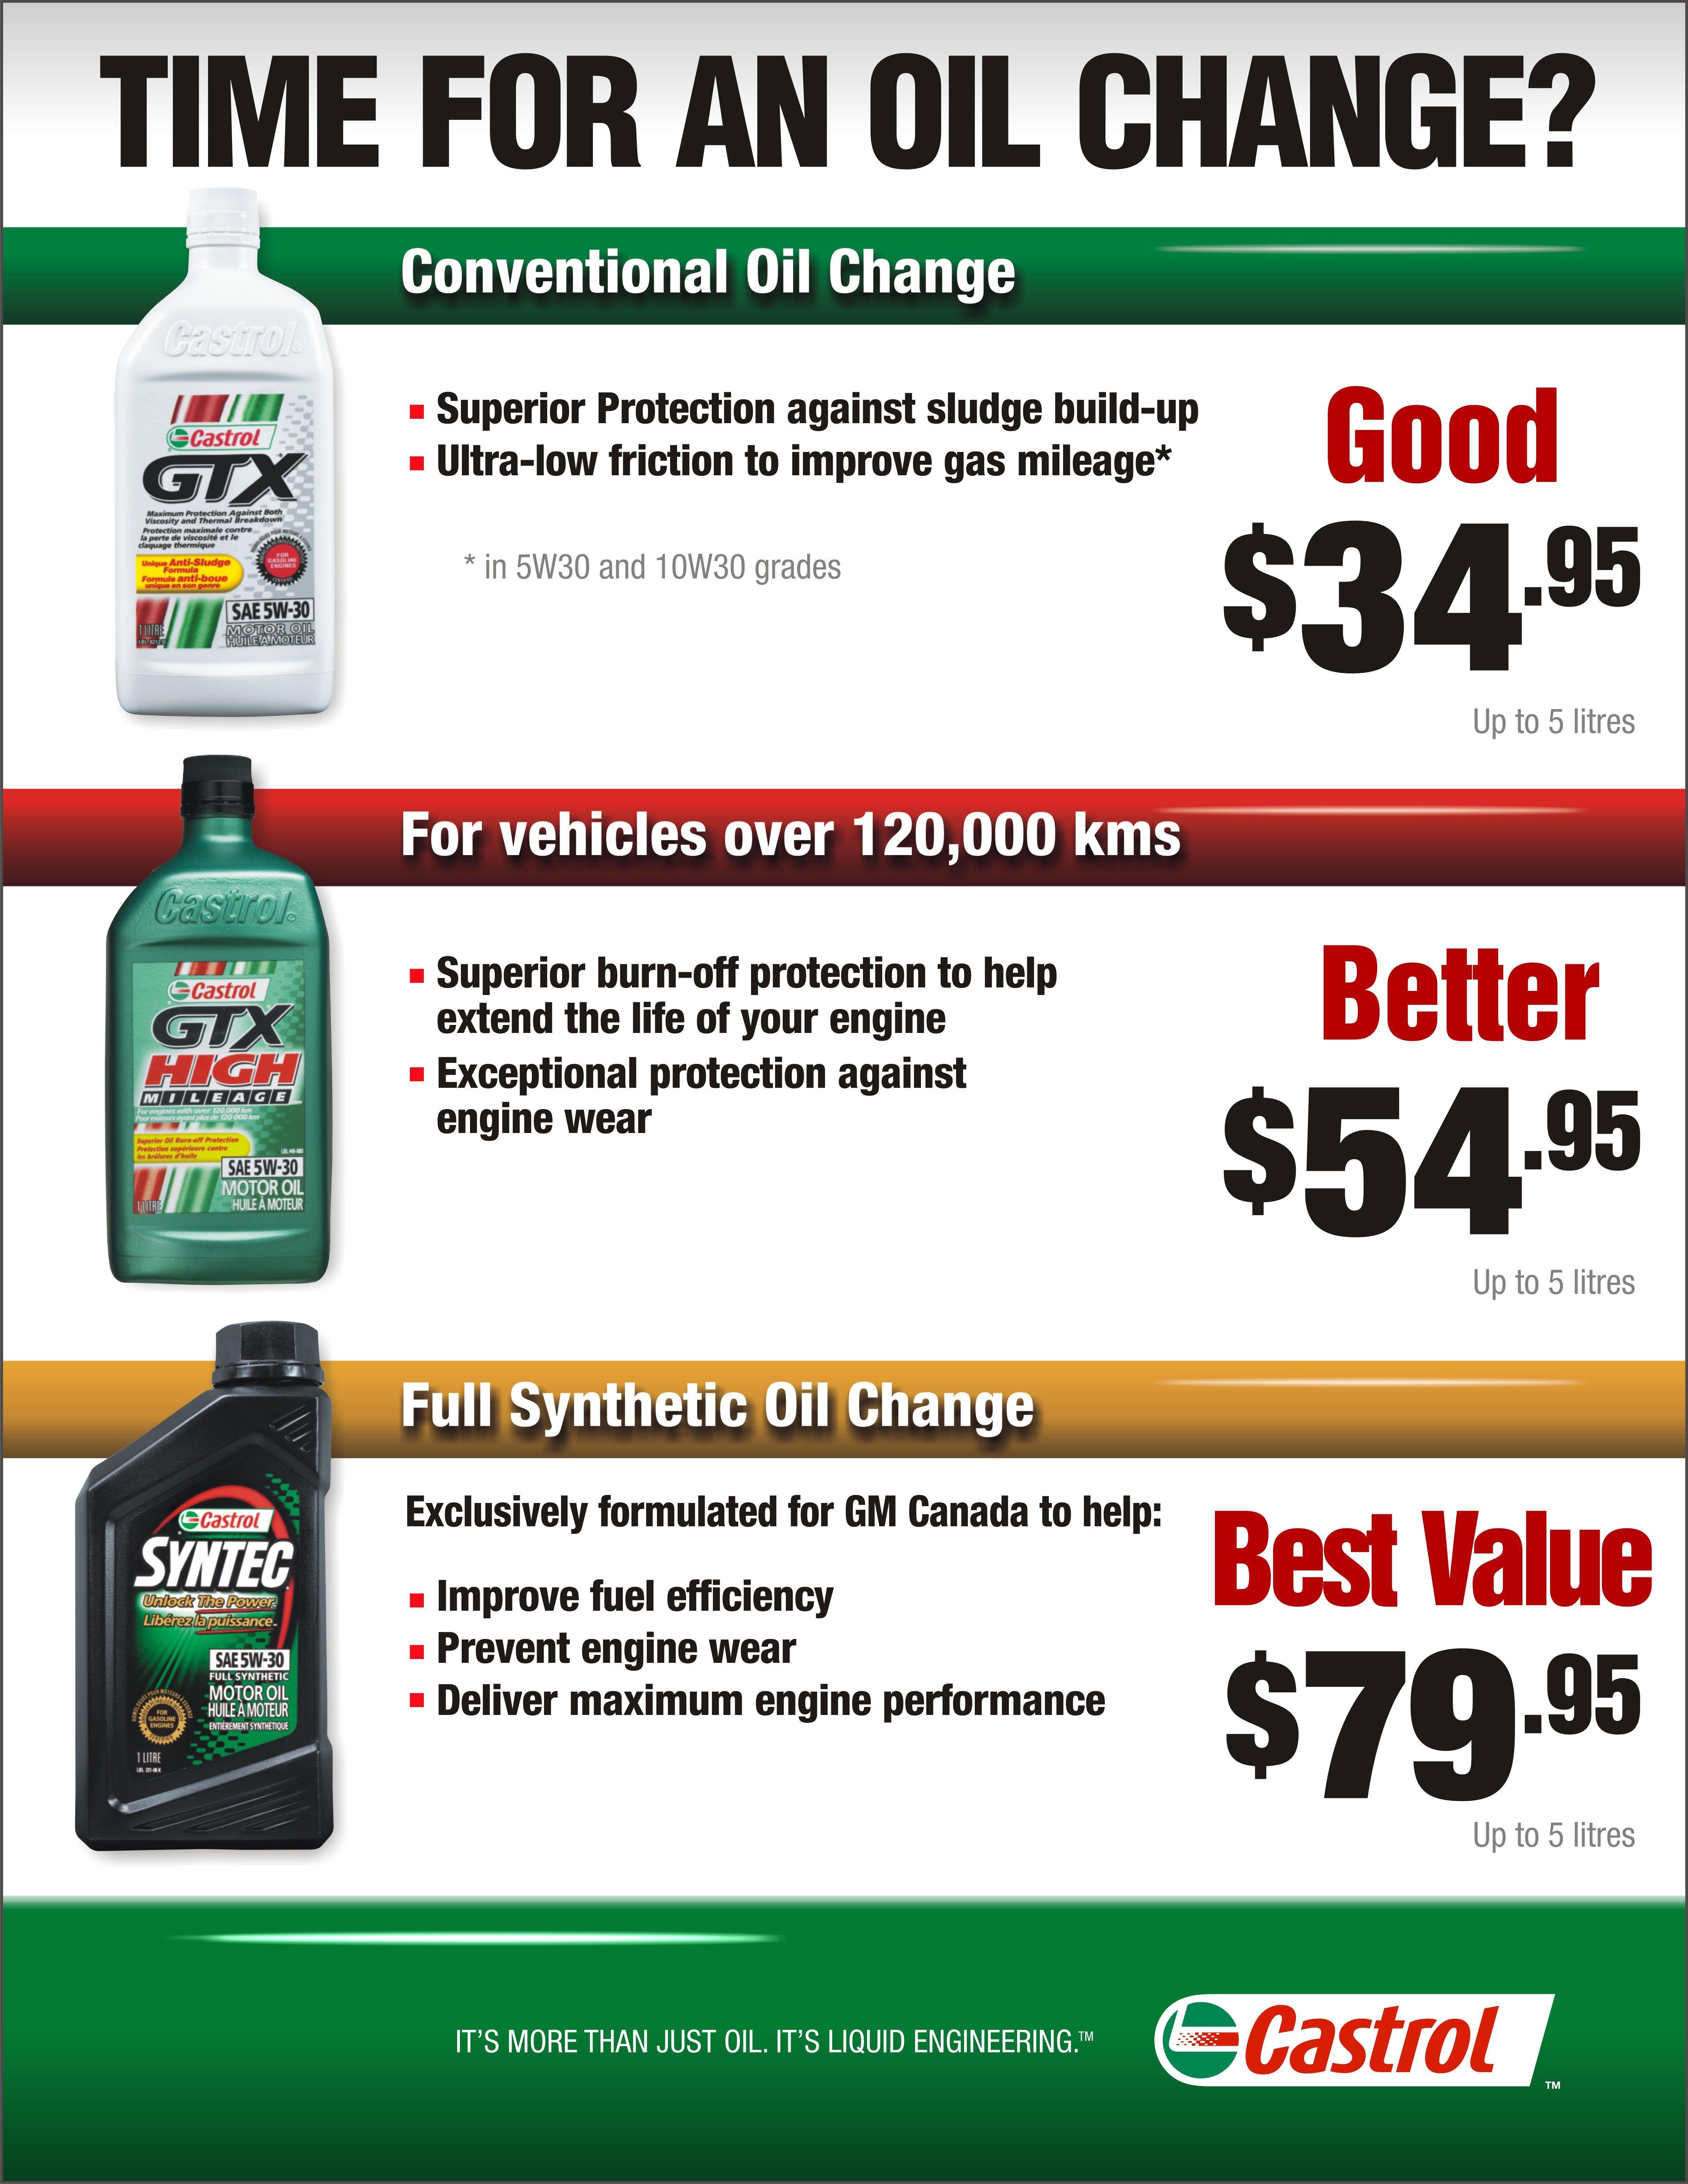 Castrol oil change prices Oil change, Castrol oil, Oils